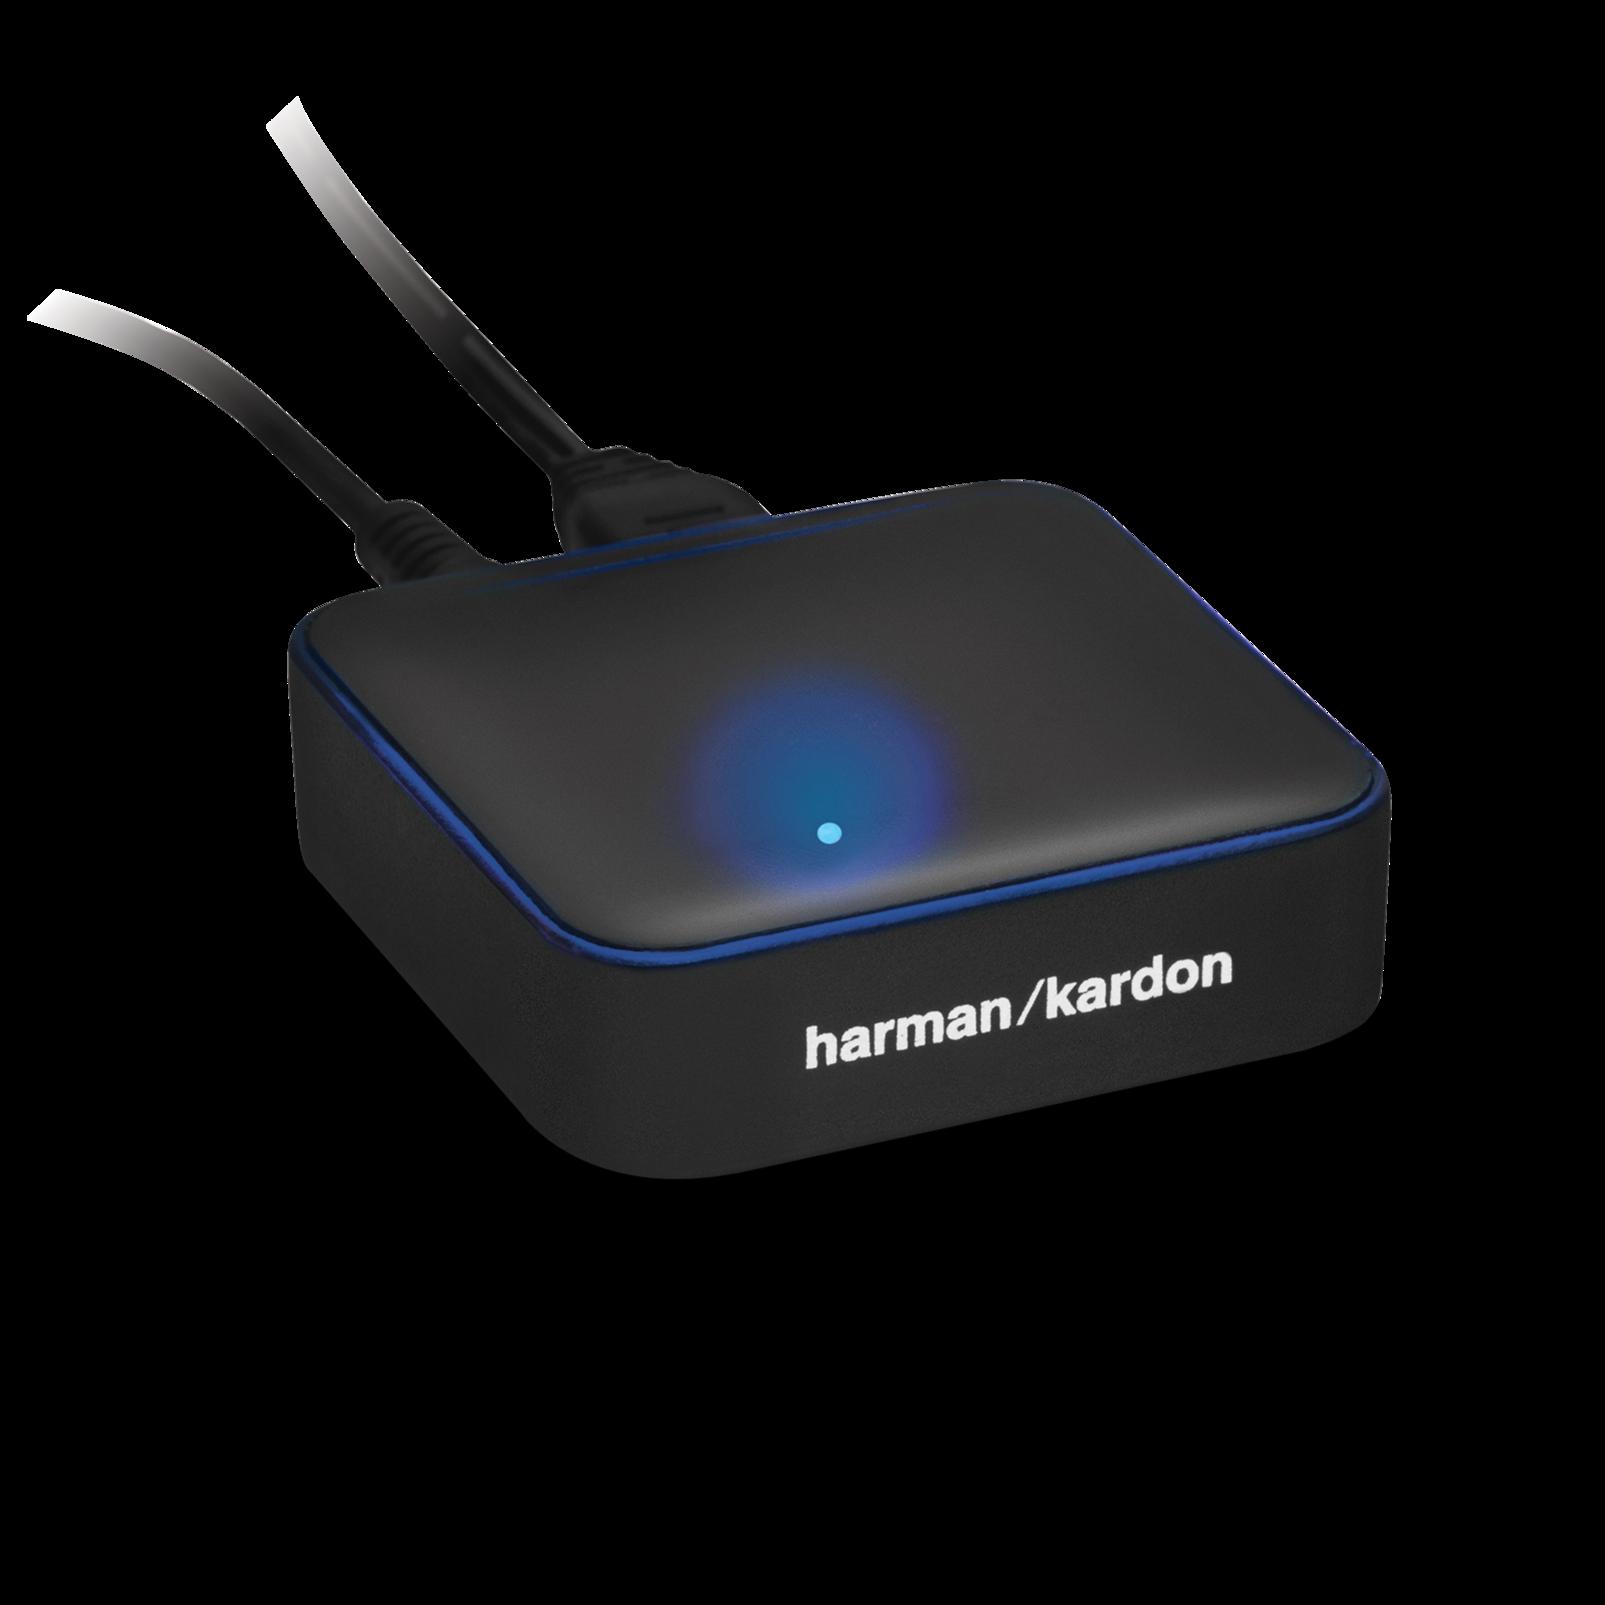 BTA 10 - Black - Top Rated Compact External Bluetooth Adapter - Hero